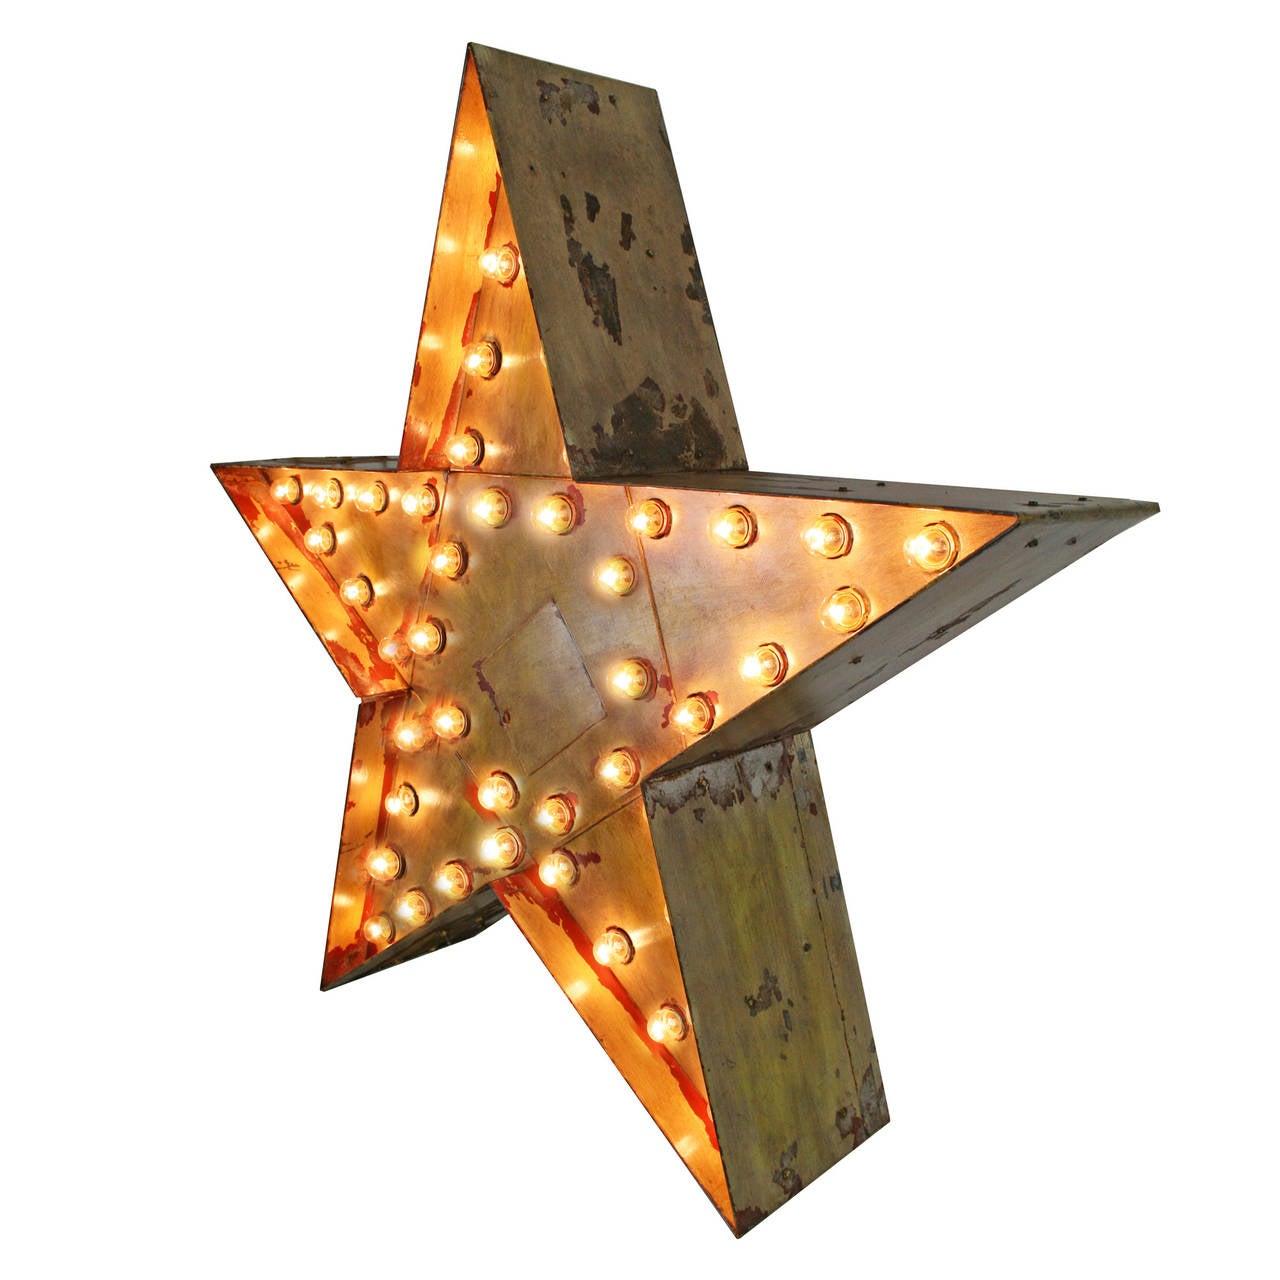 Giant Lighted Flashing Star Sign, circa 1955 2